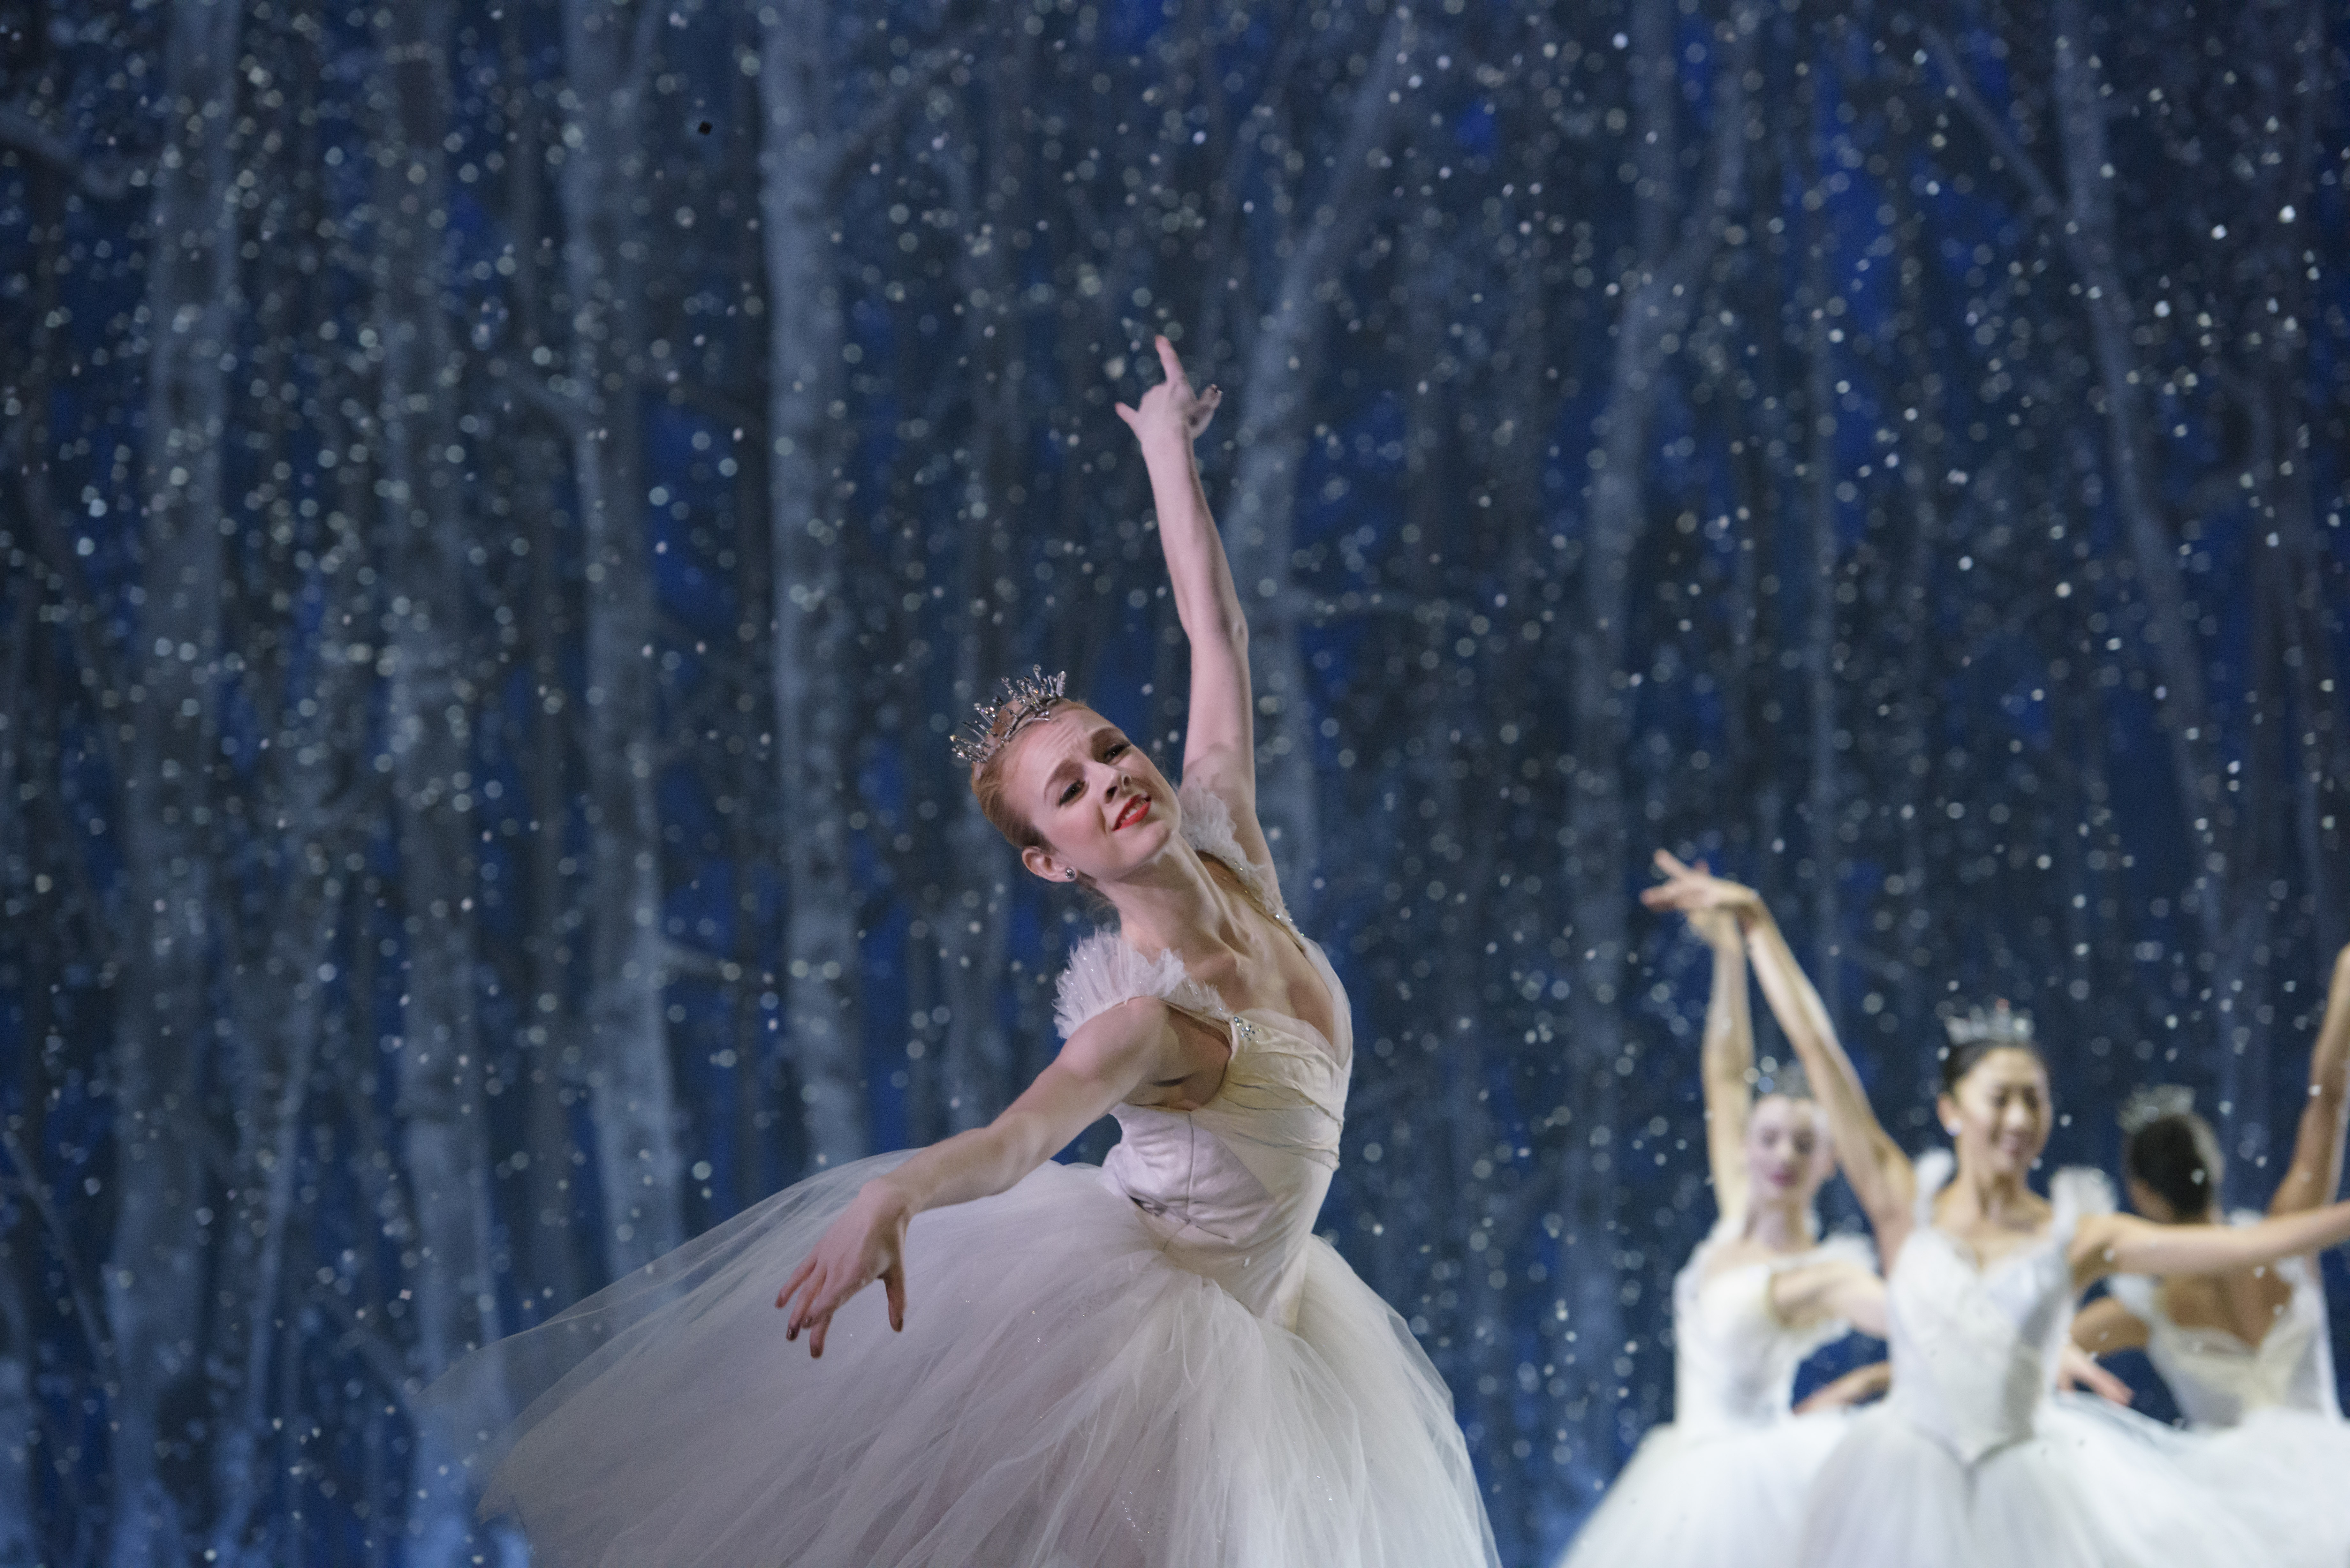 ballet dancer in the snow